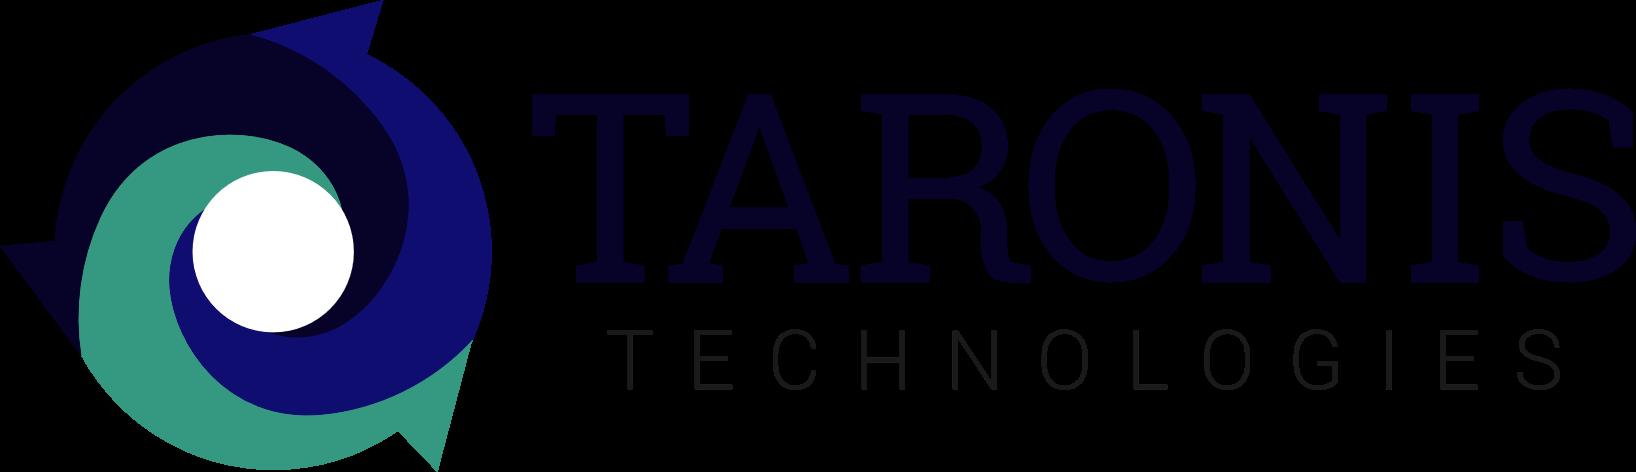 Taronis Technologies